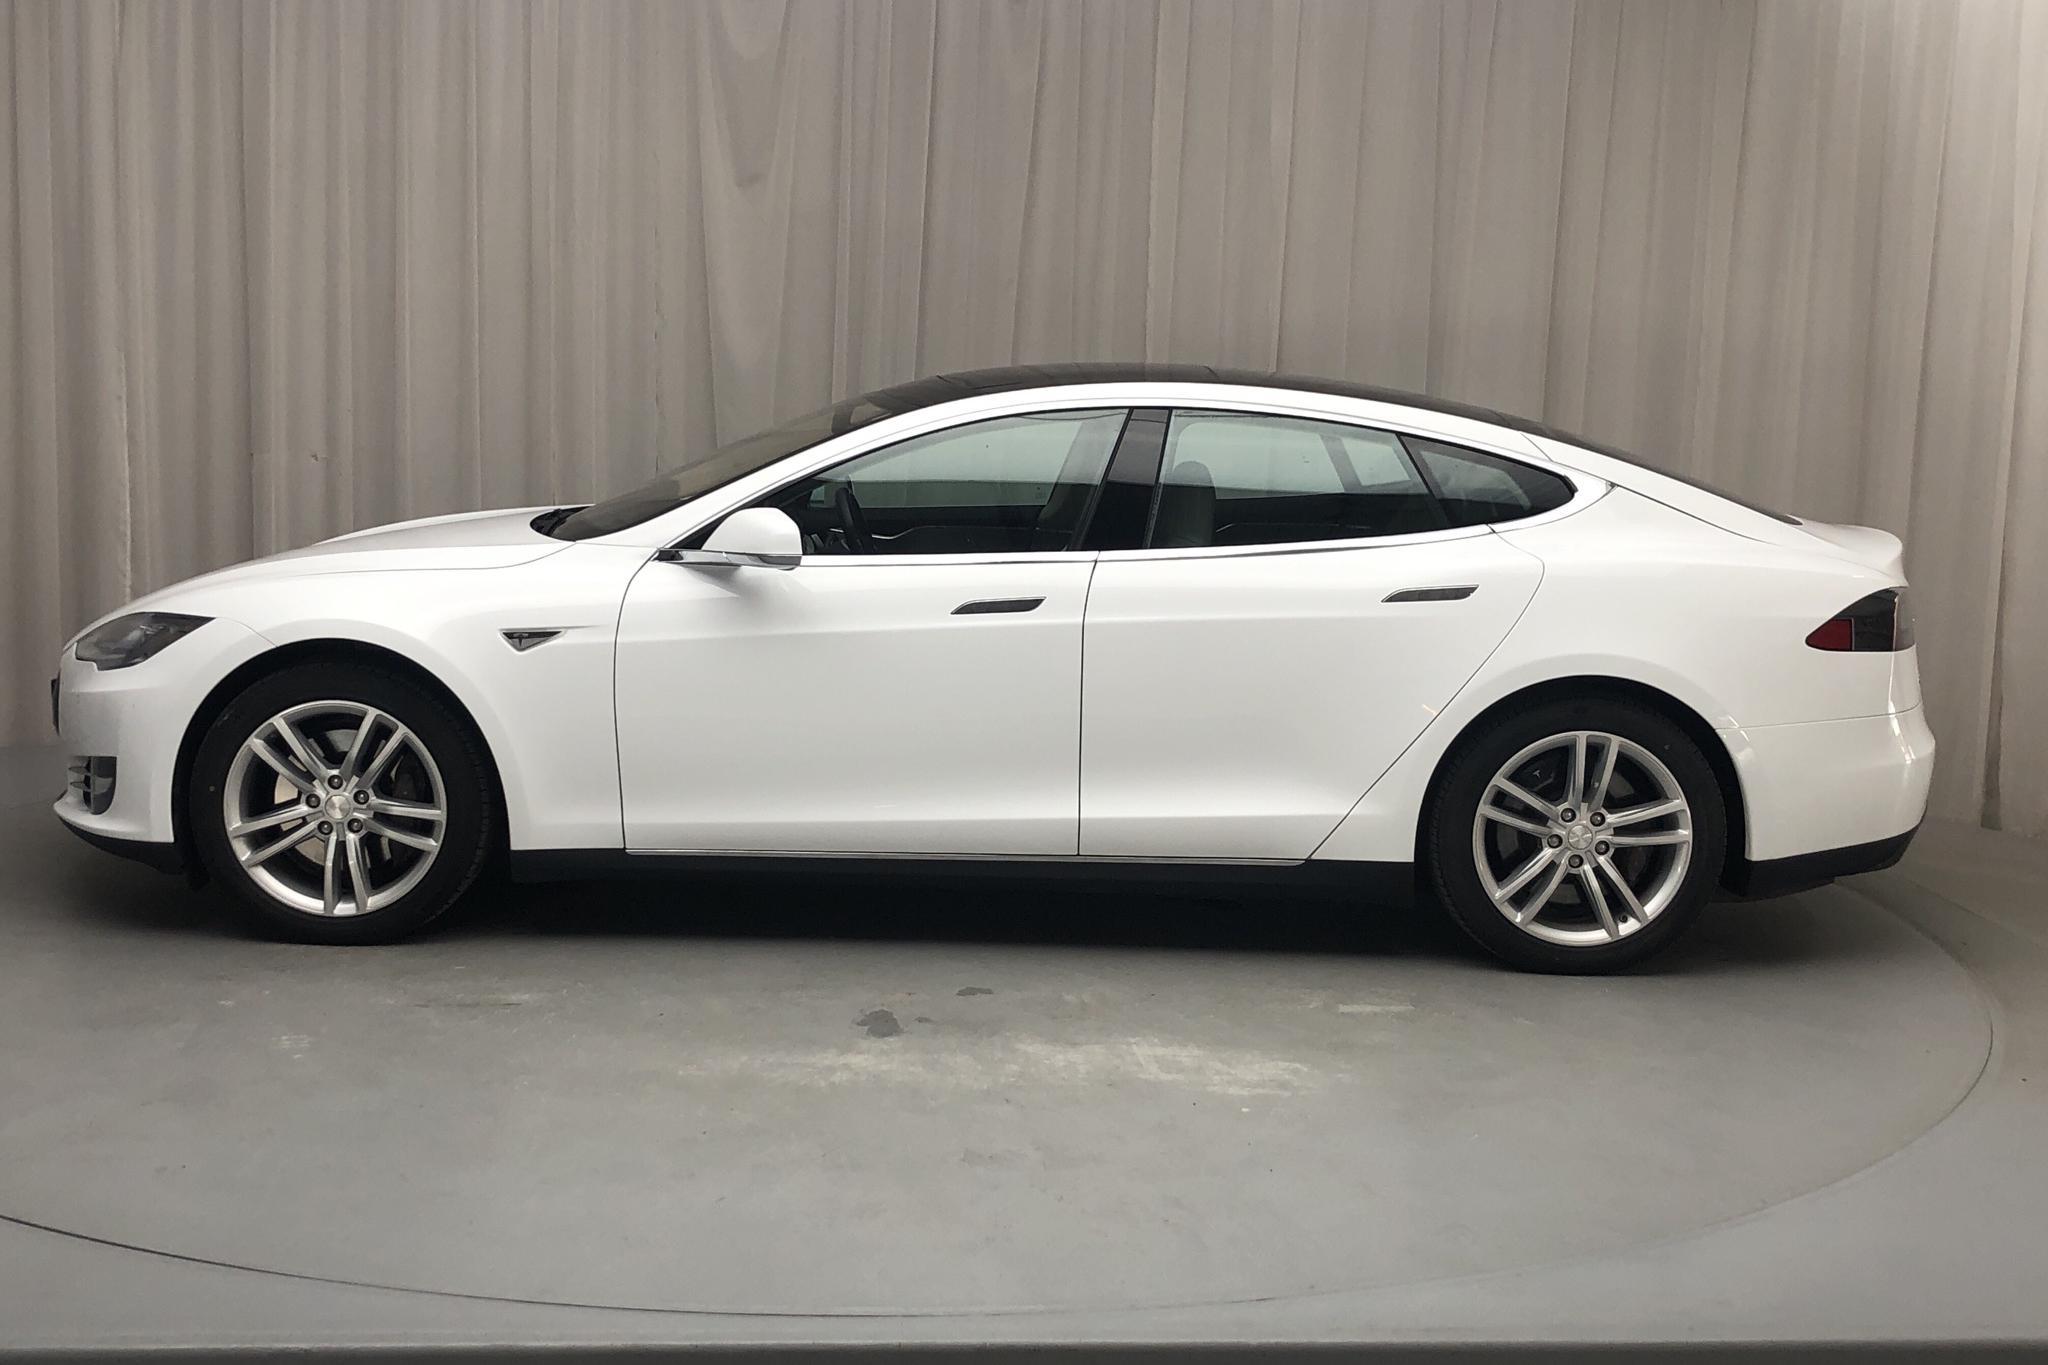 Tesla Model S 85 (367hk) - 115 480 km - Automatic - white - 2014